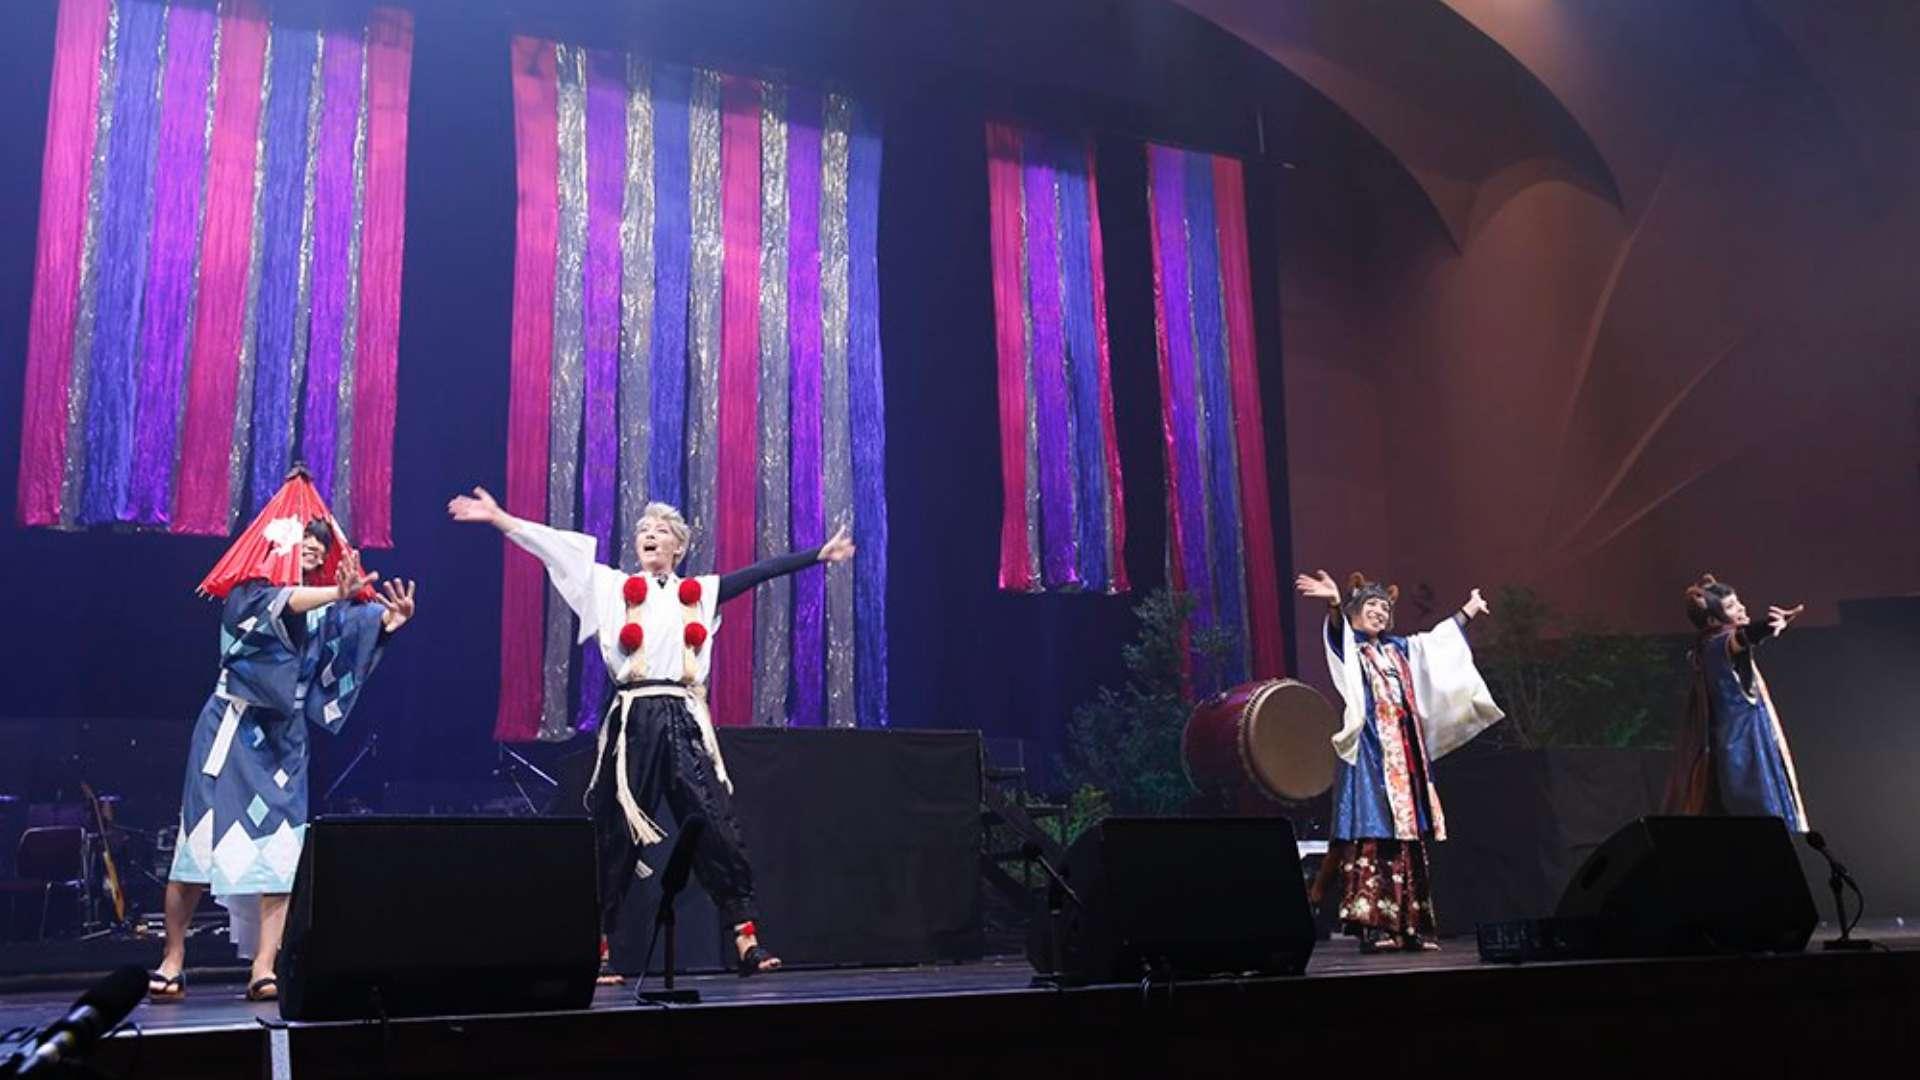 ツキプロ文化祭2018 SUMMER『月野百鬼夜行外伝 夏夢祭』